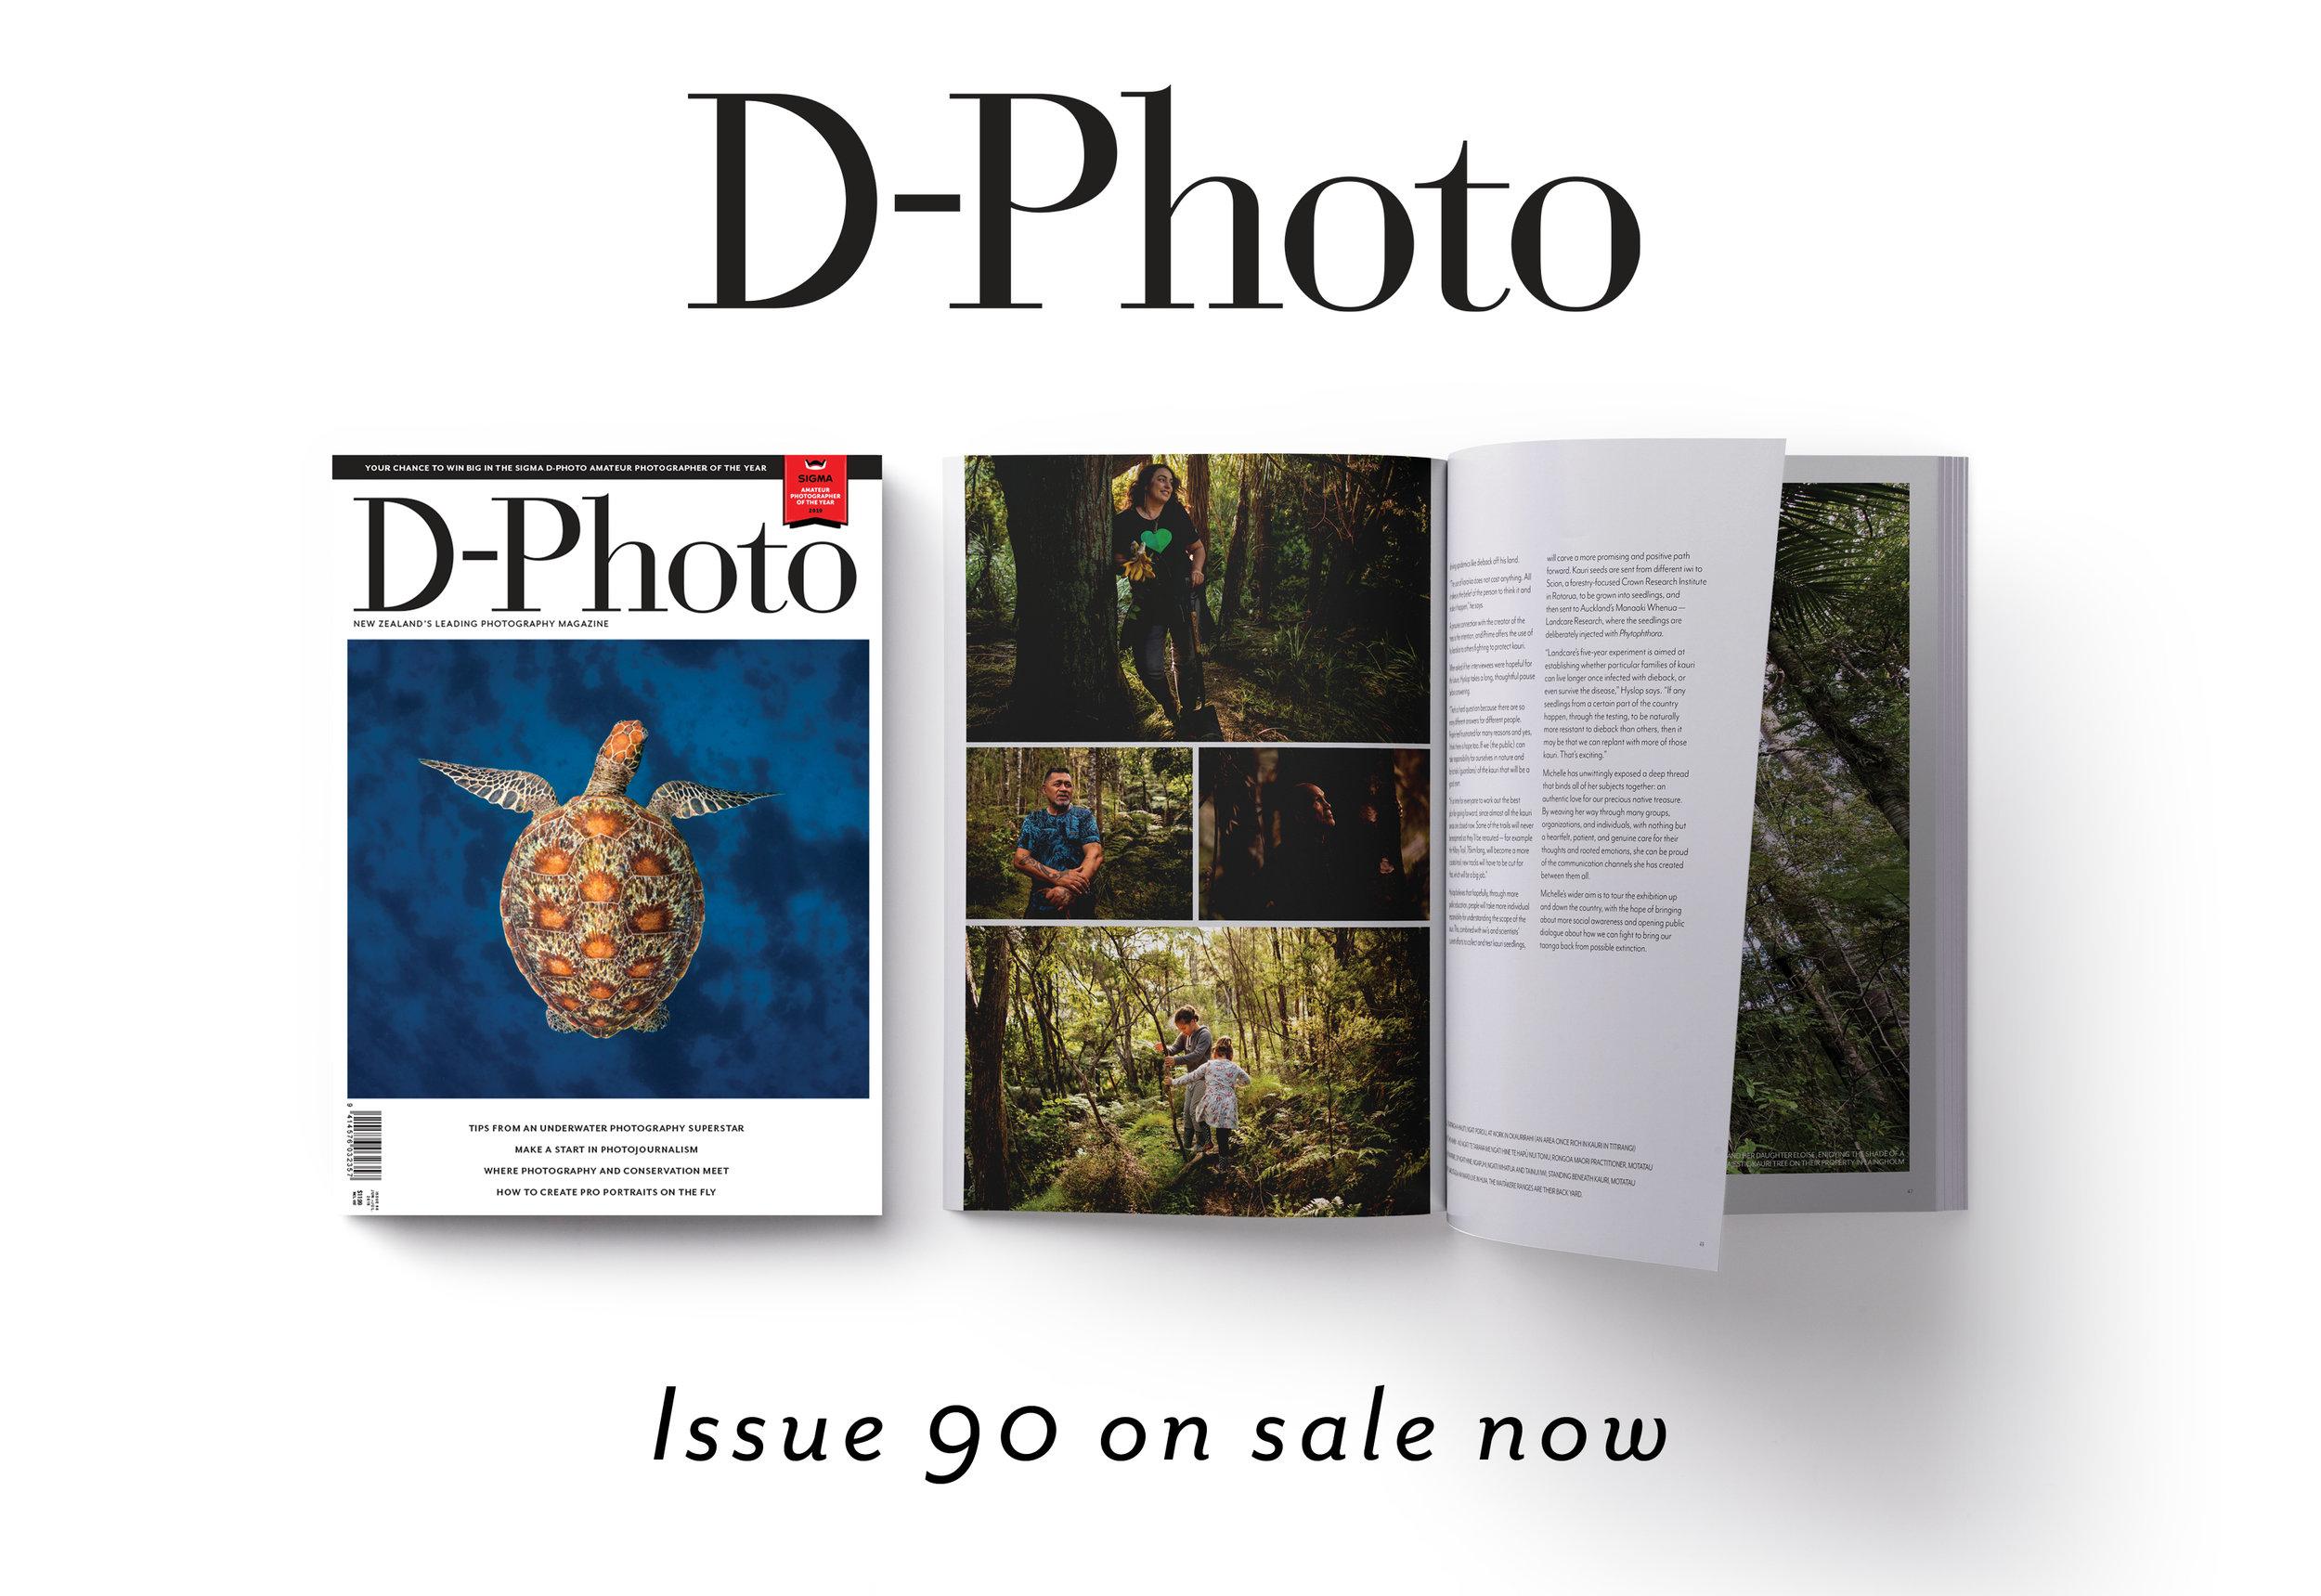 D-Photo 90 Mag Cover.jpg